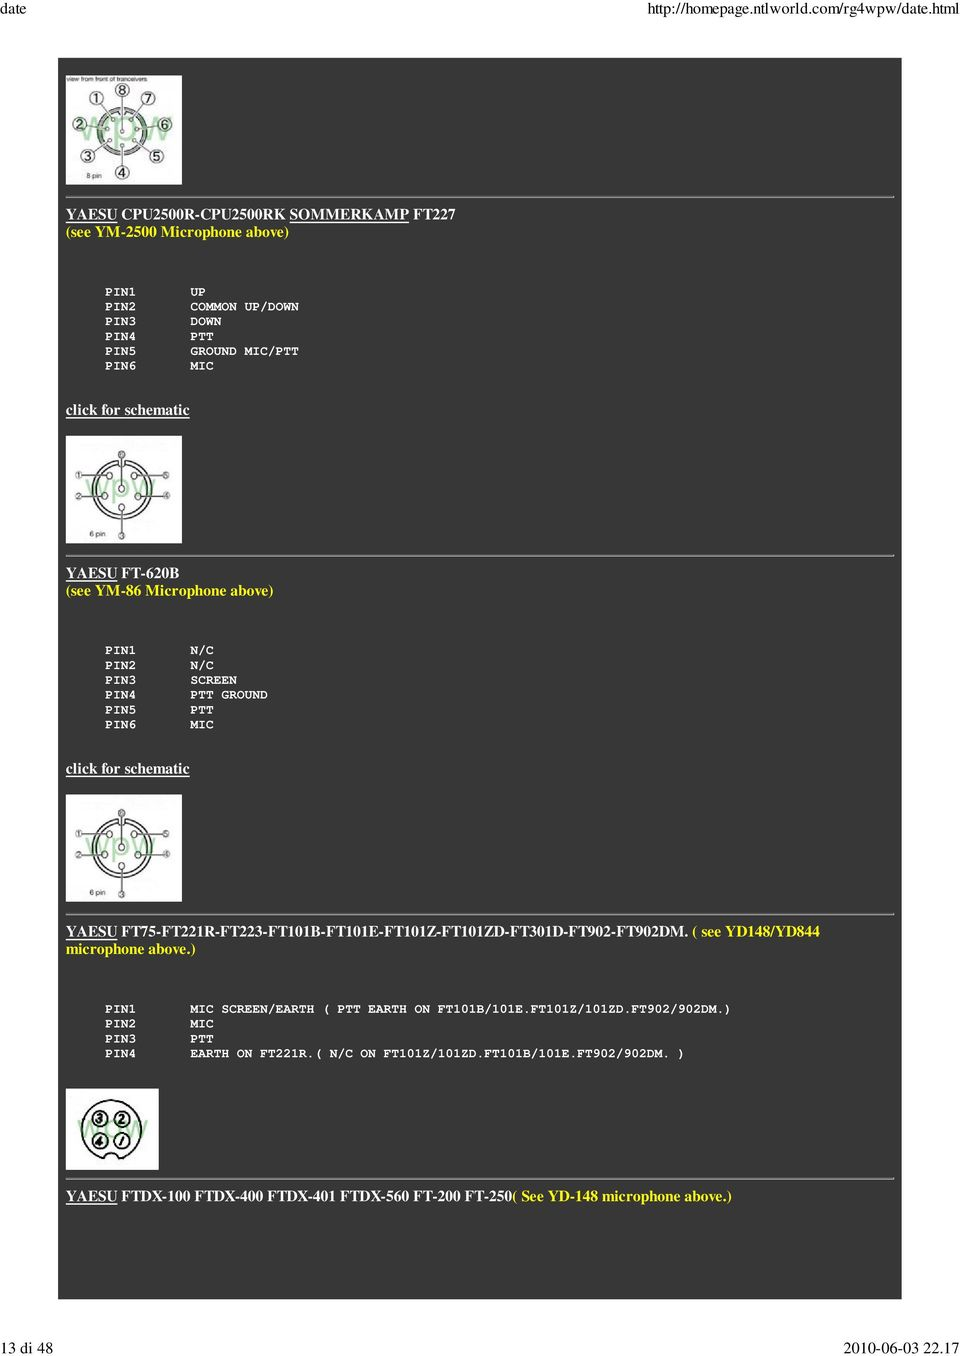 i ic 7000 microphone wiring diagram wiring diagram library i ic 7000 microphone wiring diagram wiring diagrams icom 7000 microphone pin out icom ic 7000